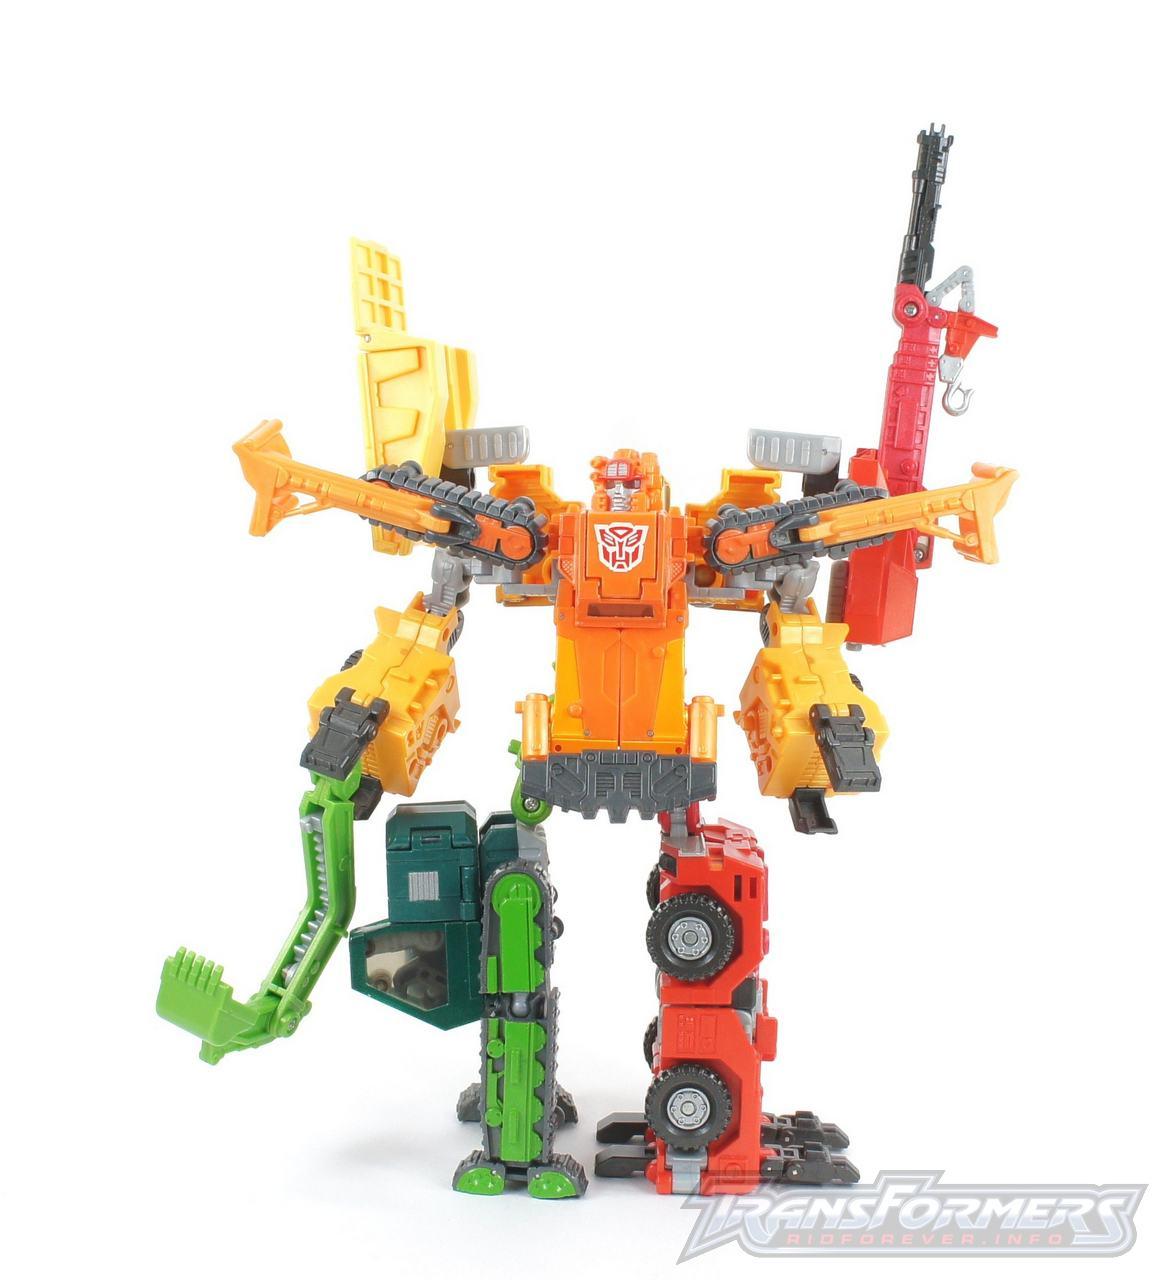 Build King 002